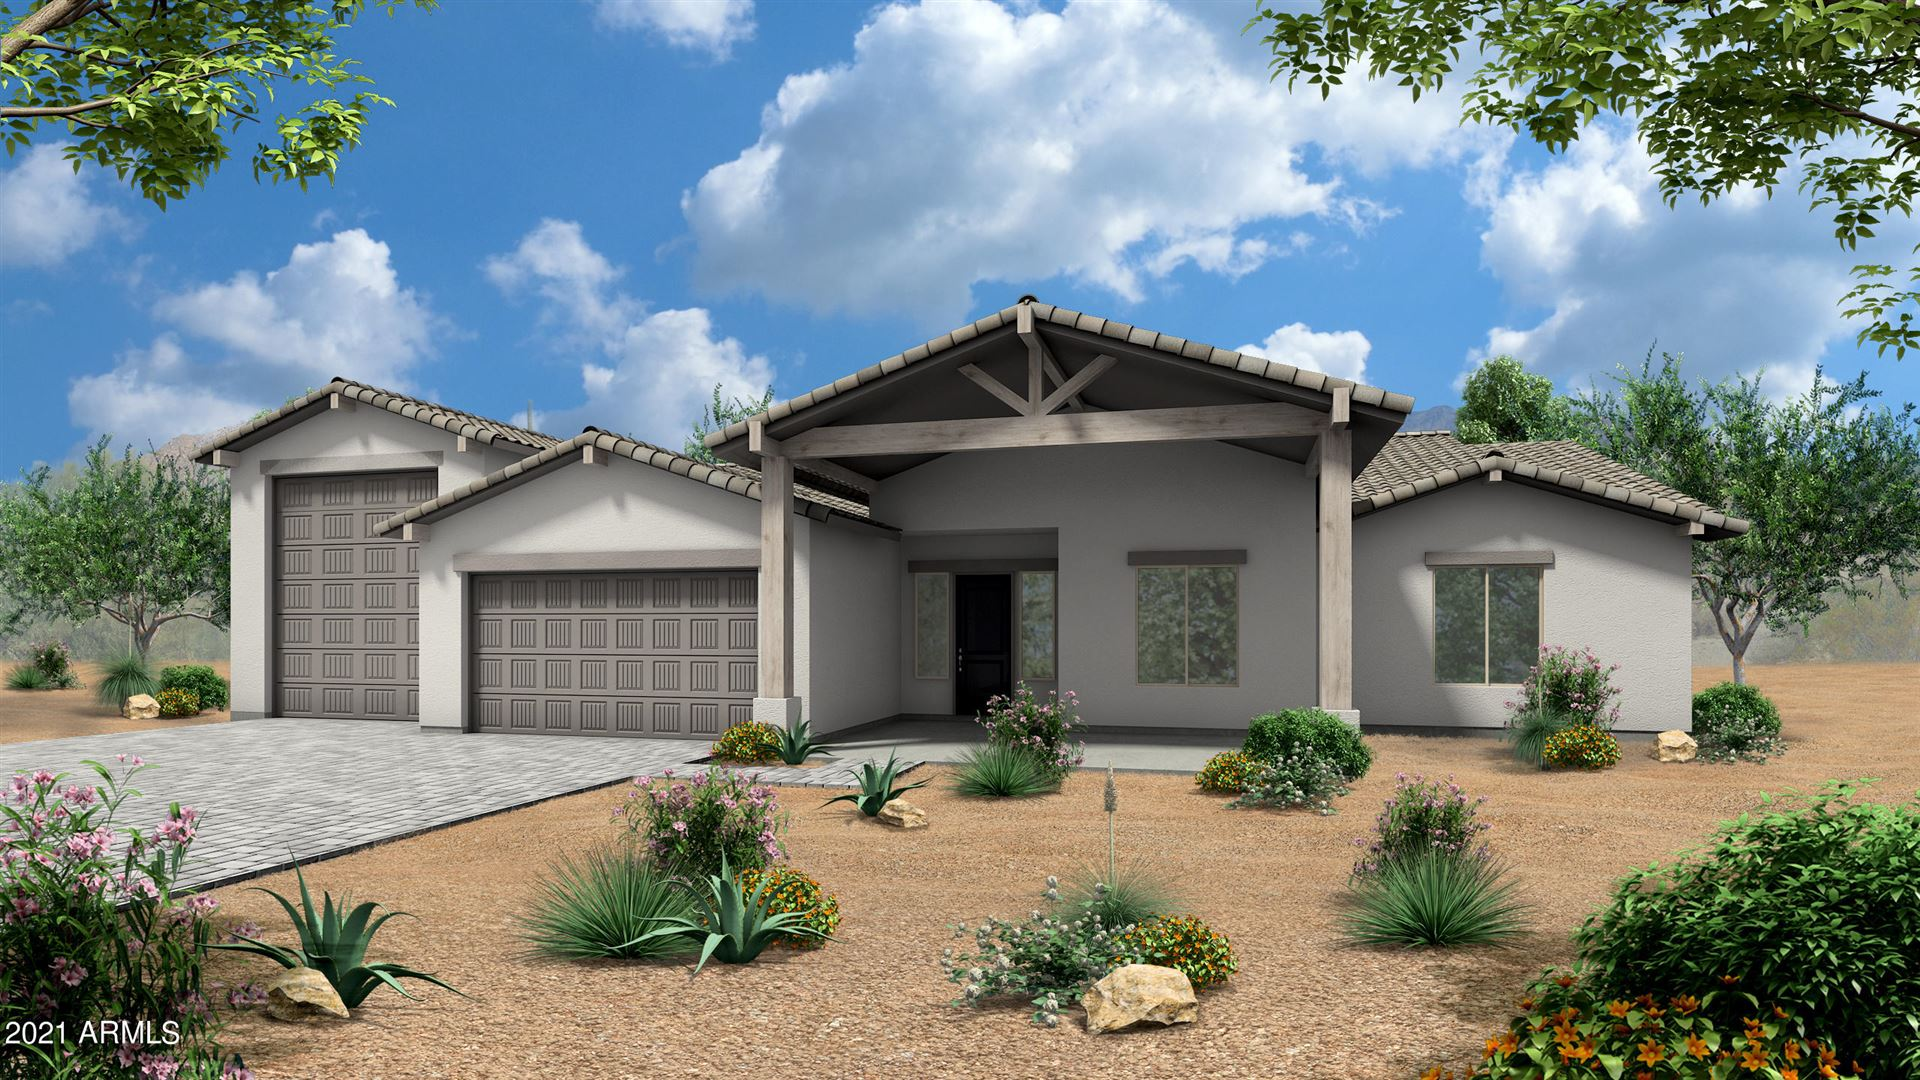 Photo of Xx213 N 21 Avenue, Desert Hills, AZ 85086 (MLS # 6232592)